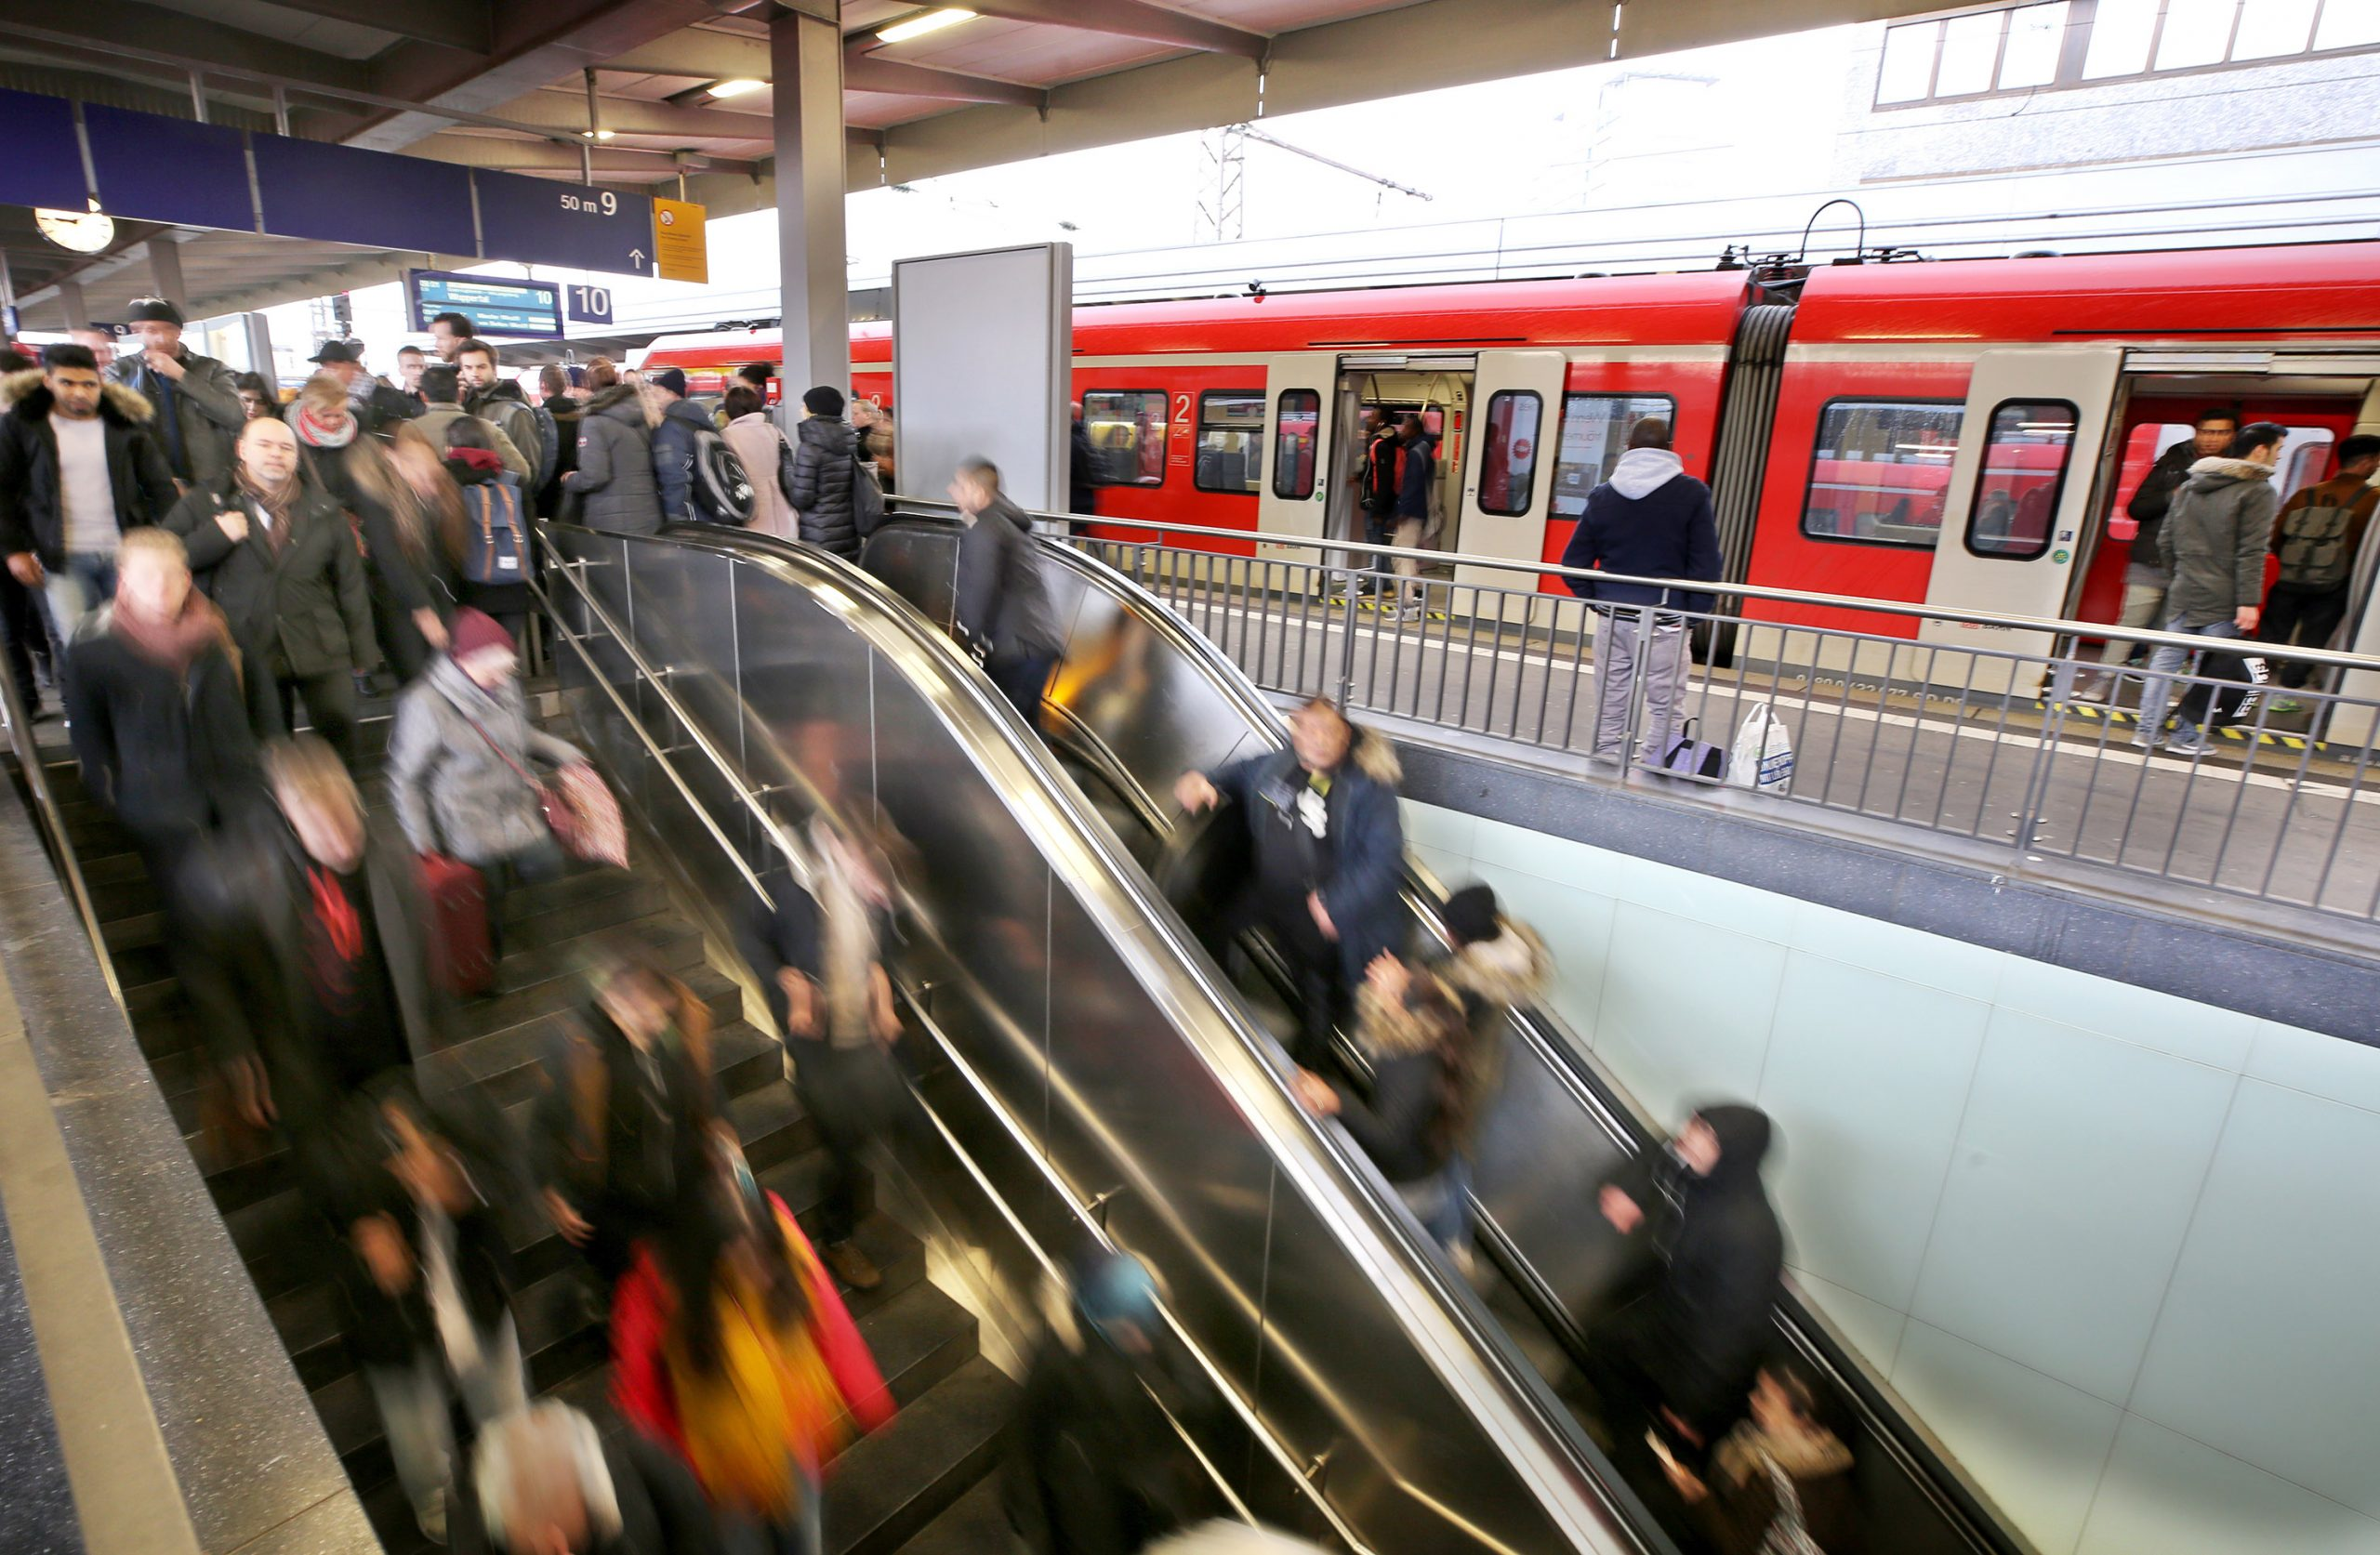 VRR Jahres PK - Hauptbahnhof Essen